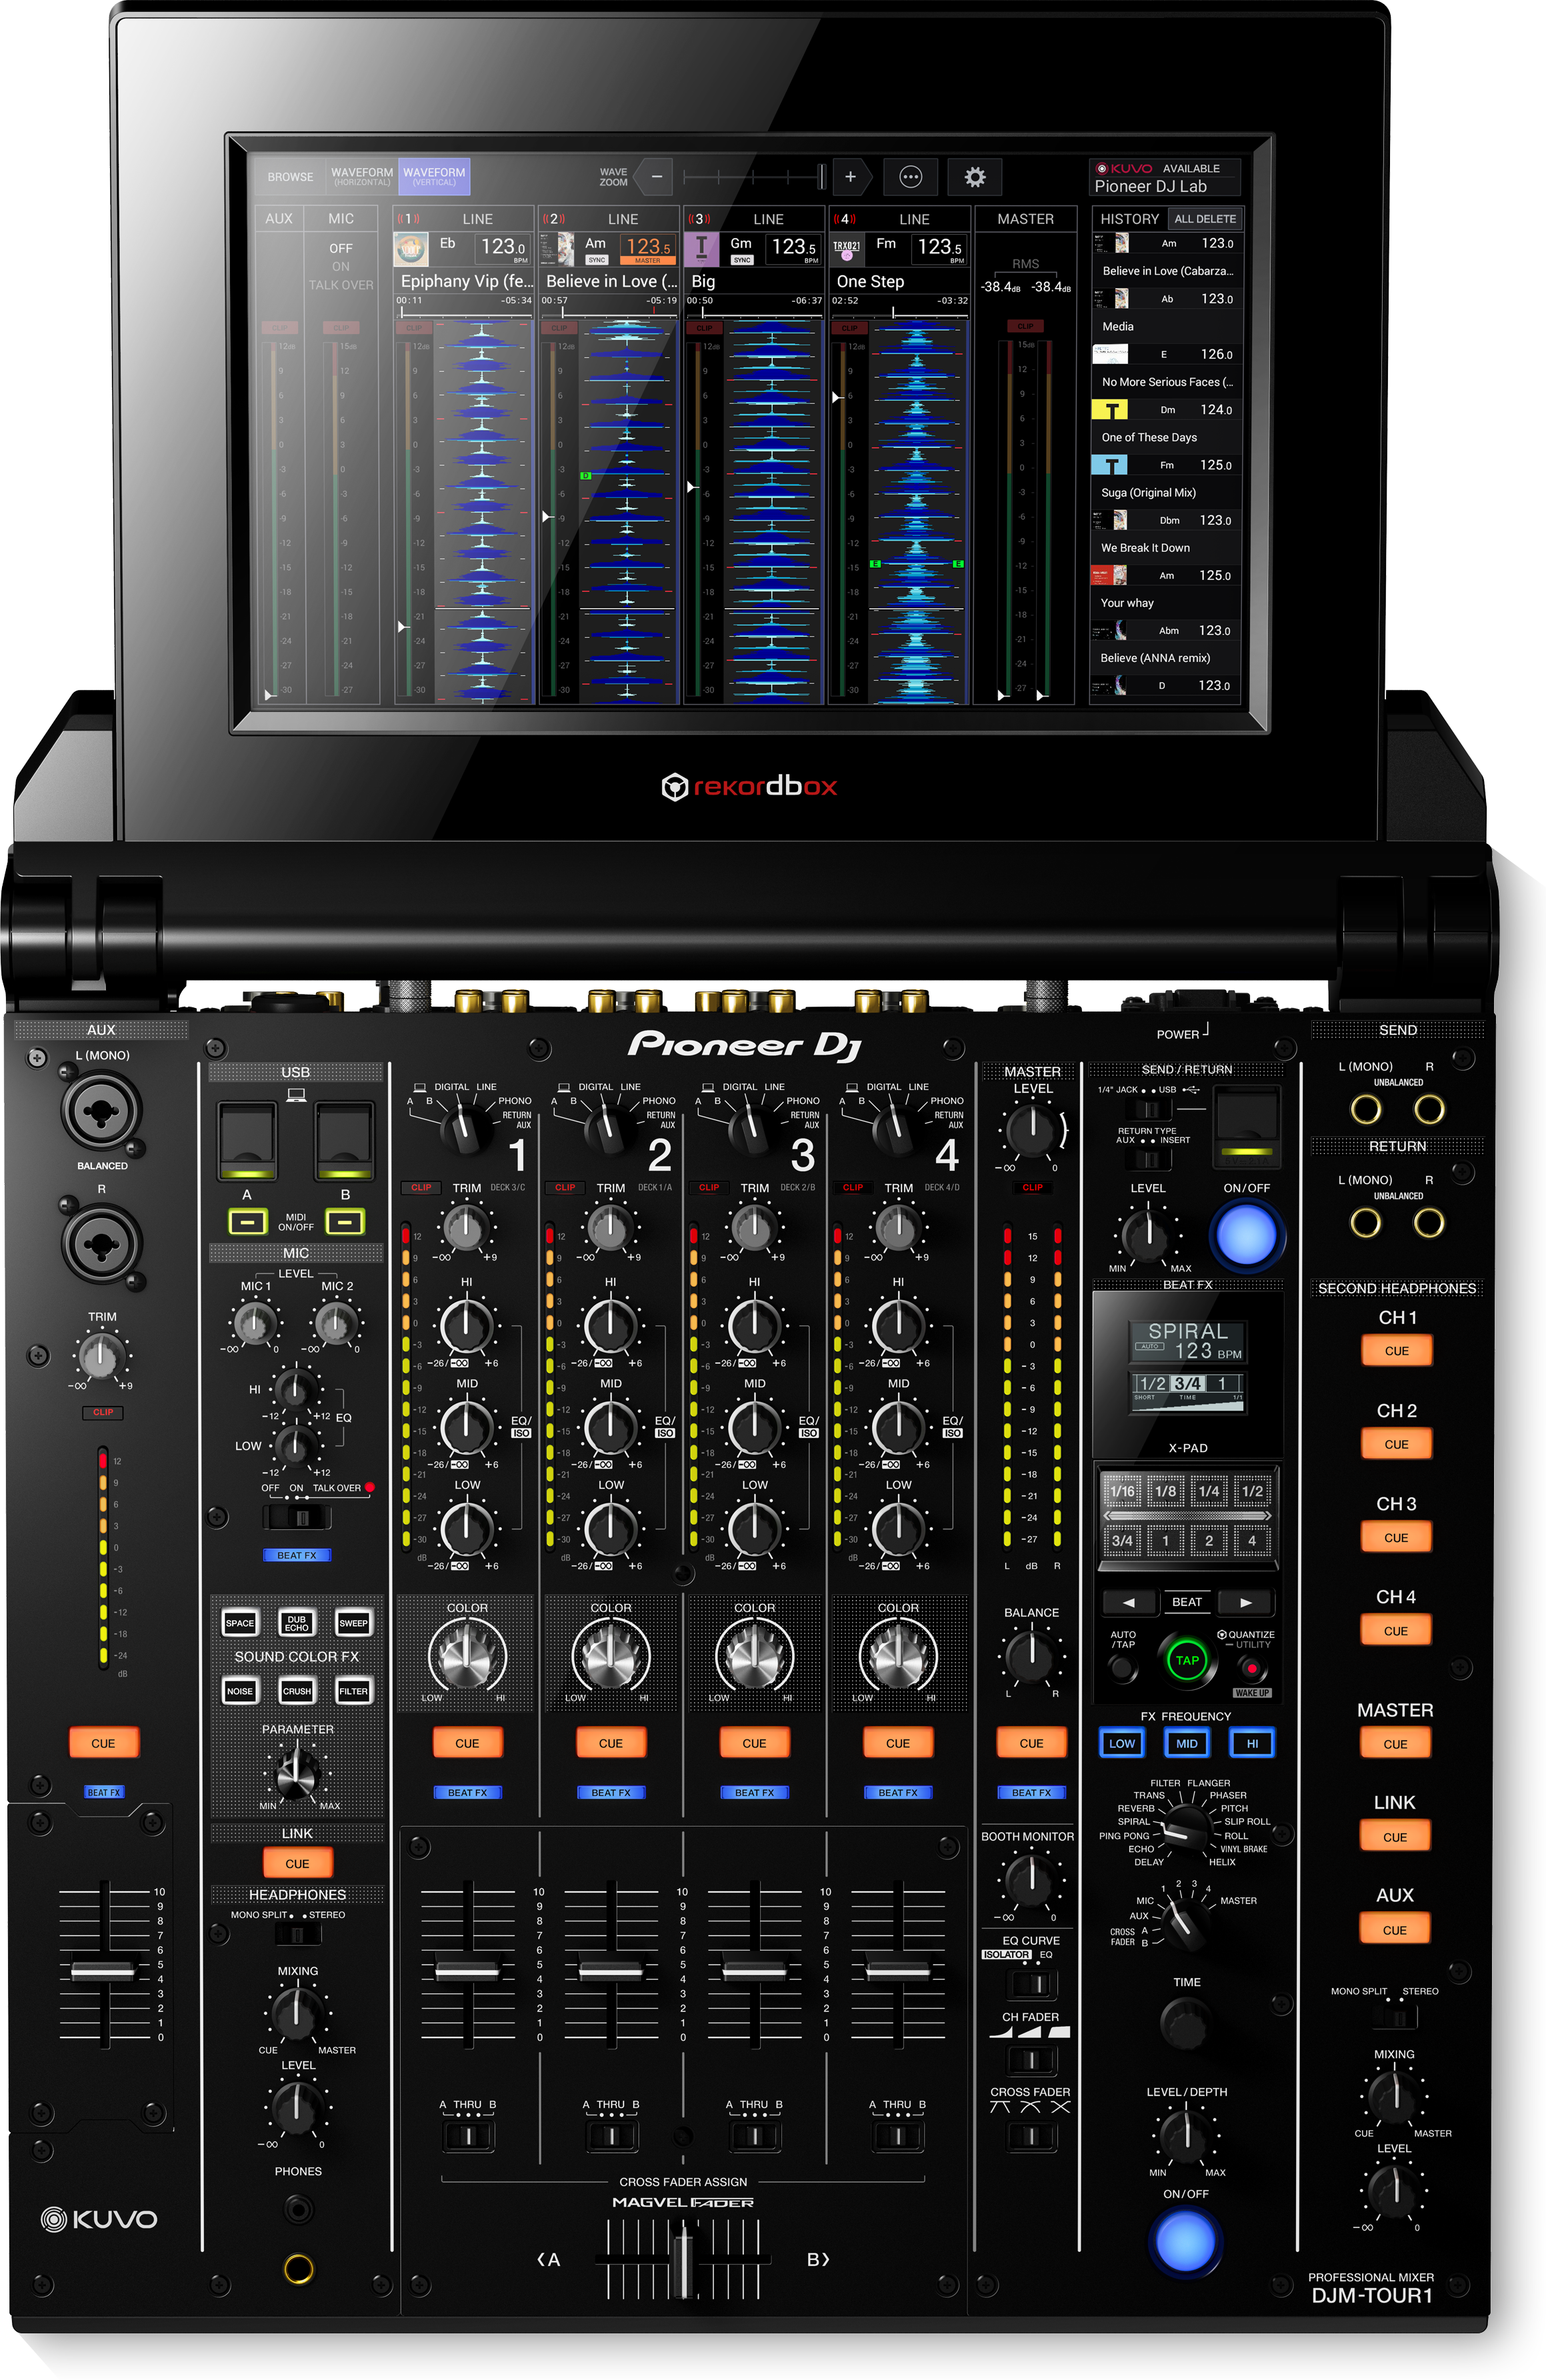 DJ mixers - Pioneer DJ - Global